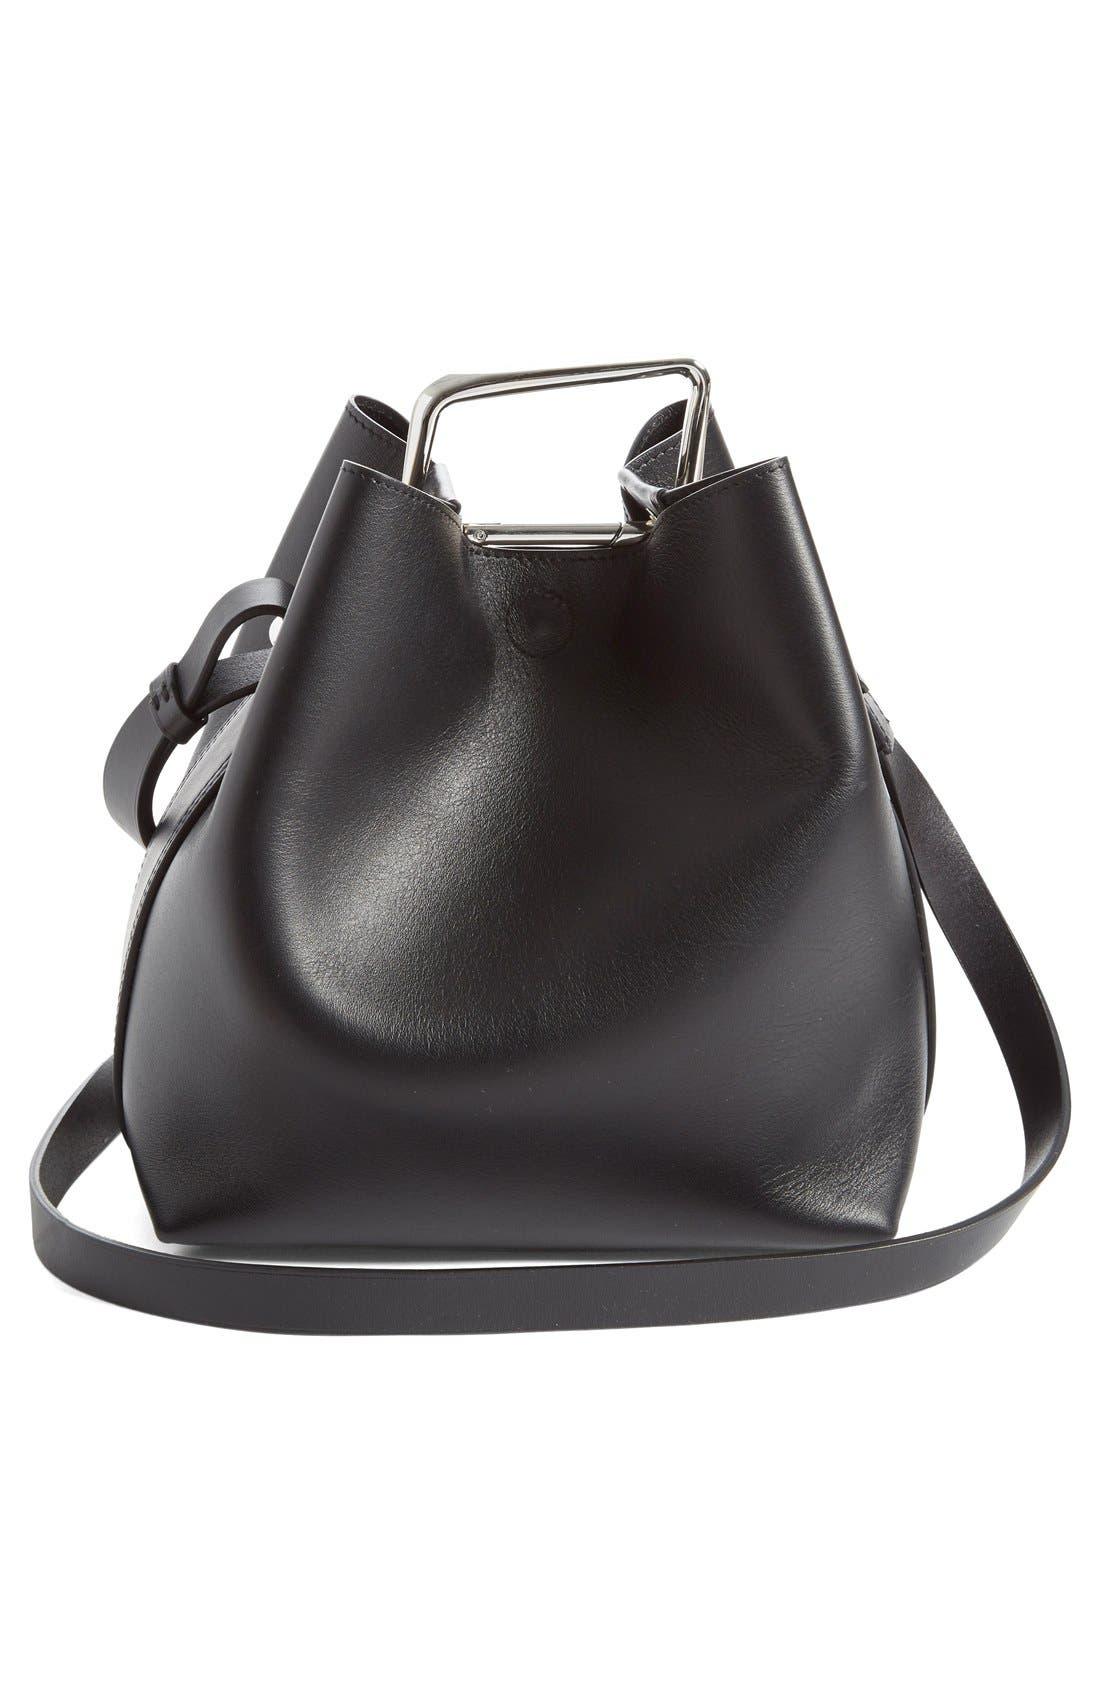 Alternate Image 3  - 3.1 Phillip Lim 'Mini Quill' Leather Bucket Bag